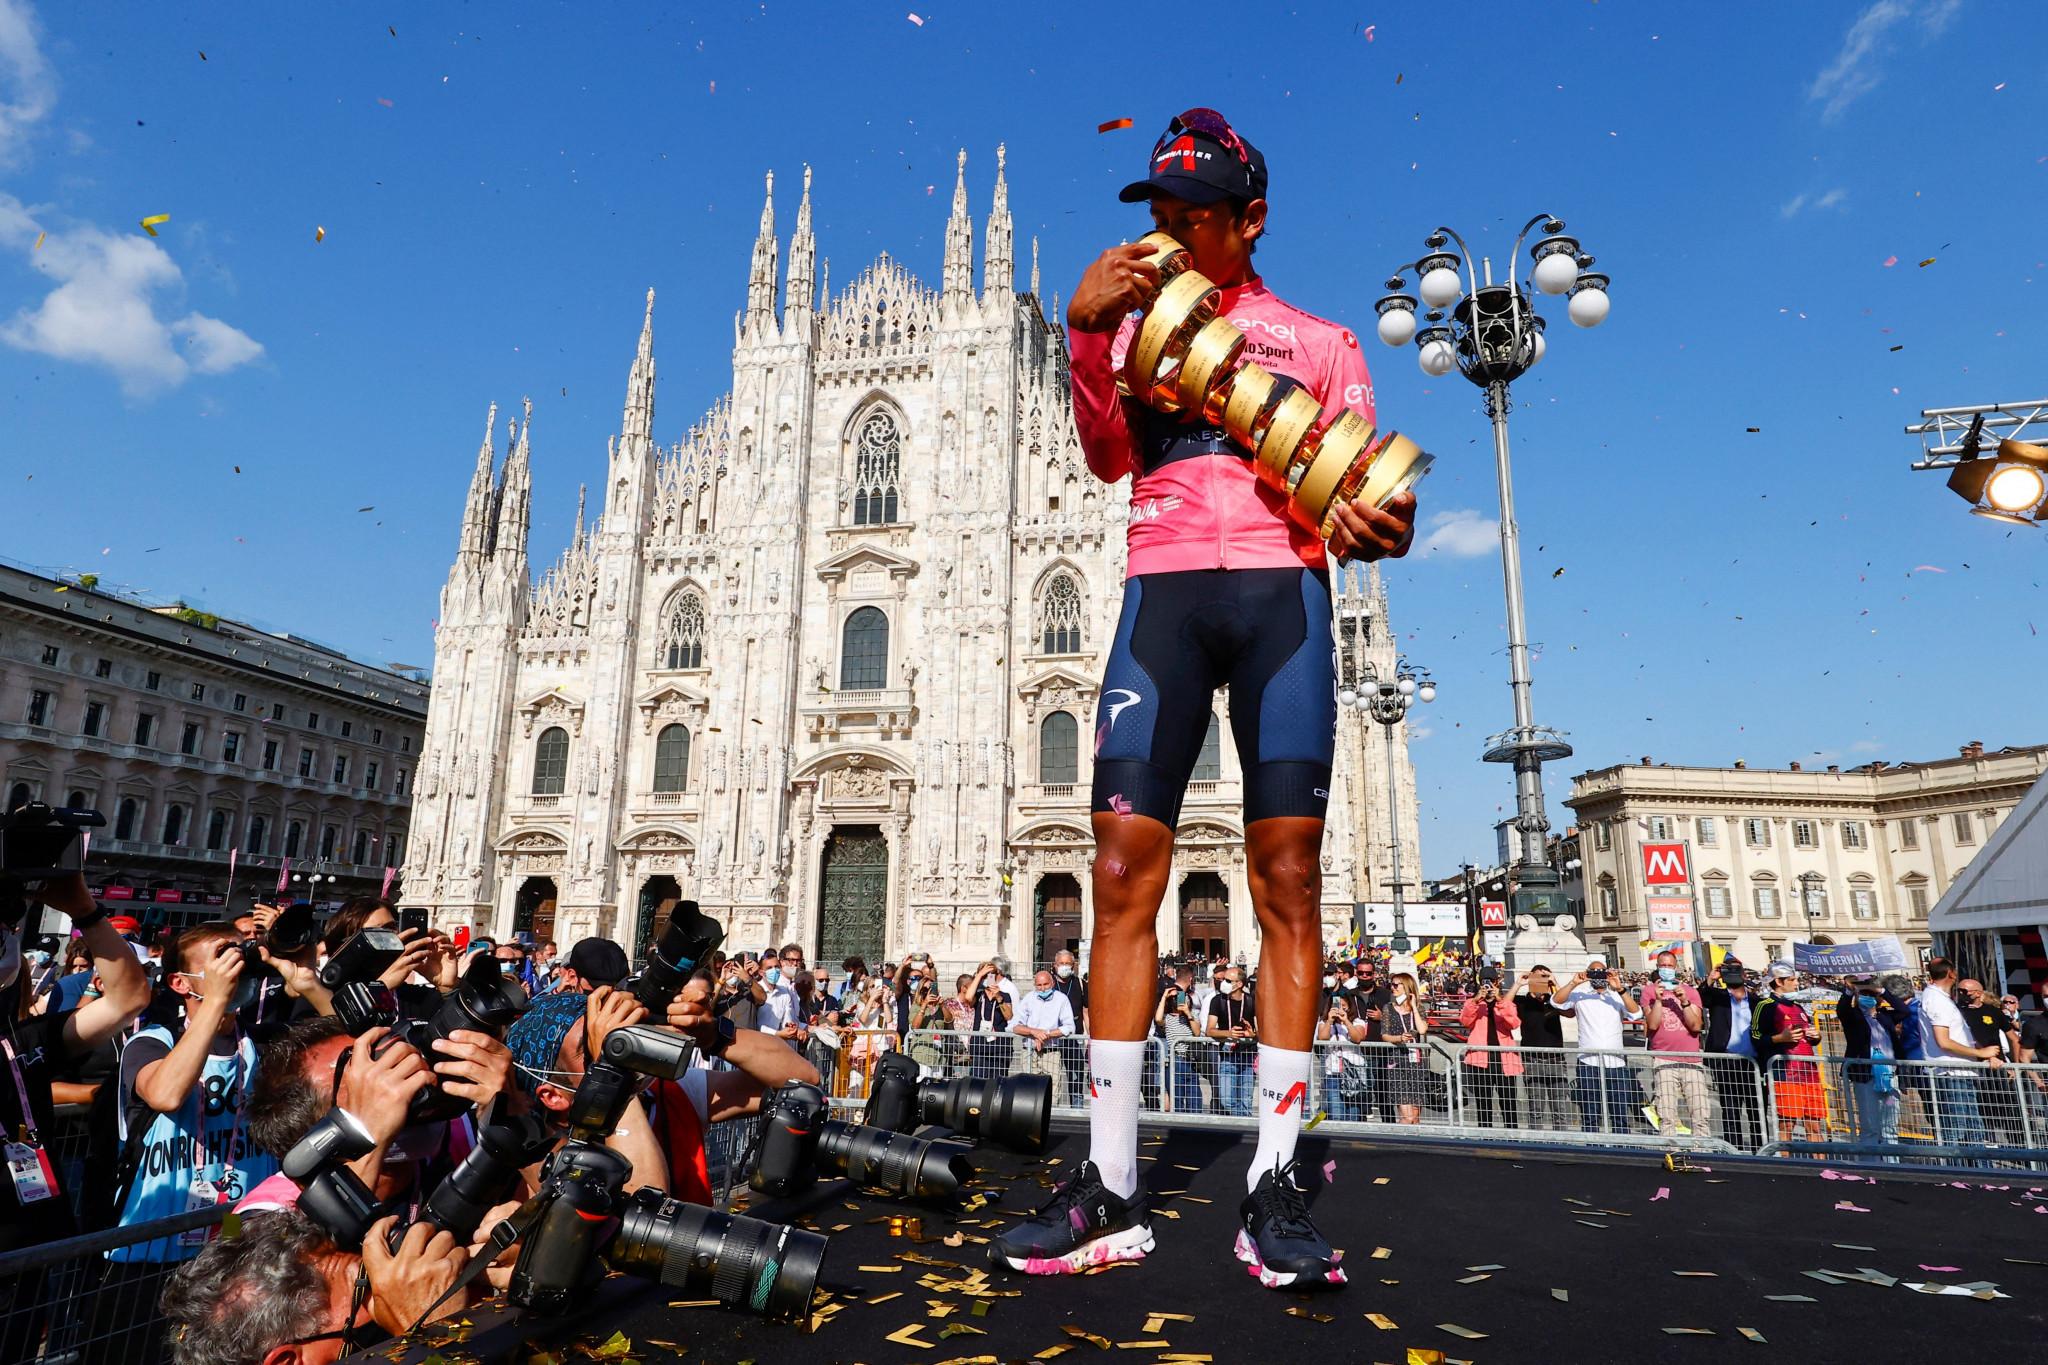 Giro d'Italia champion Bernal tests positive for COVID-19